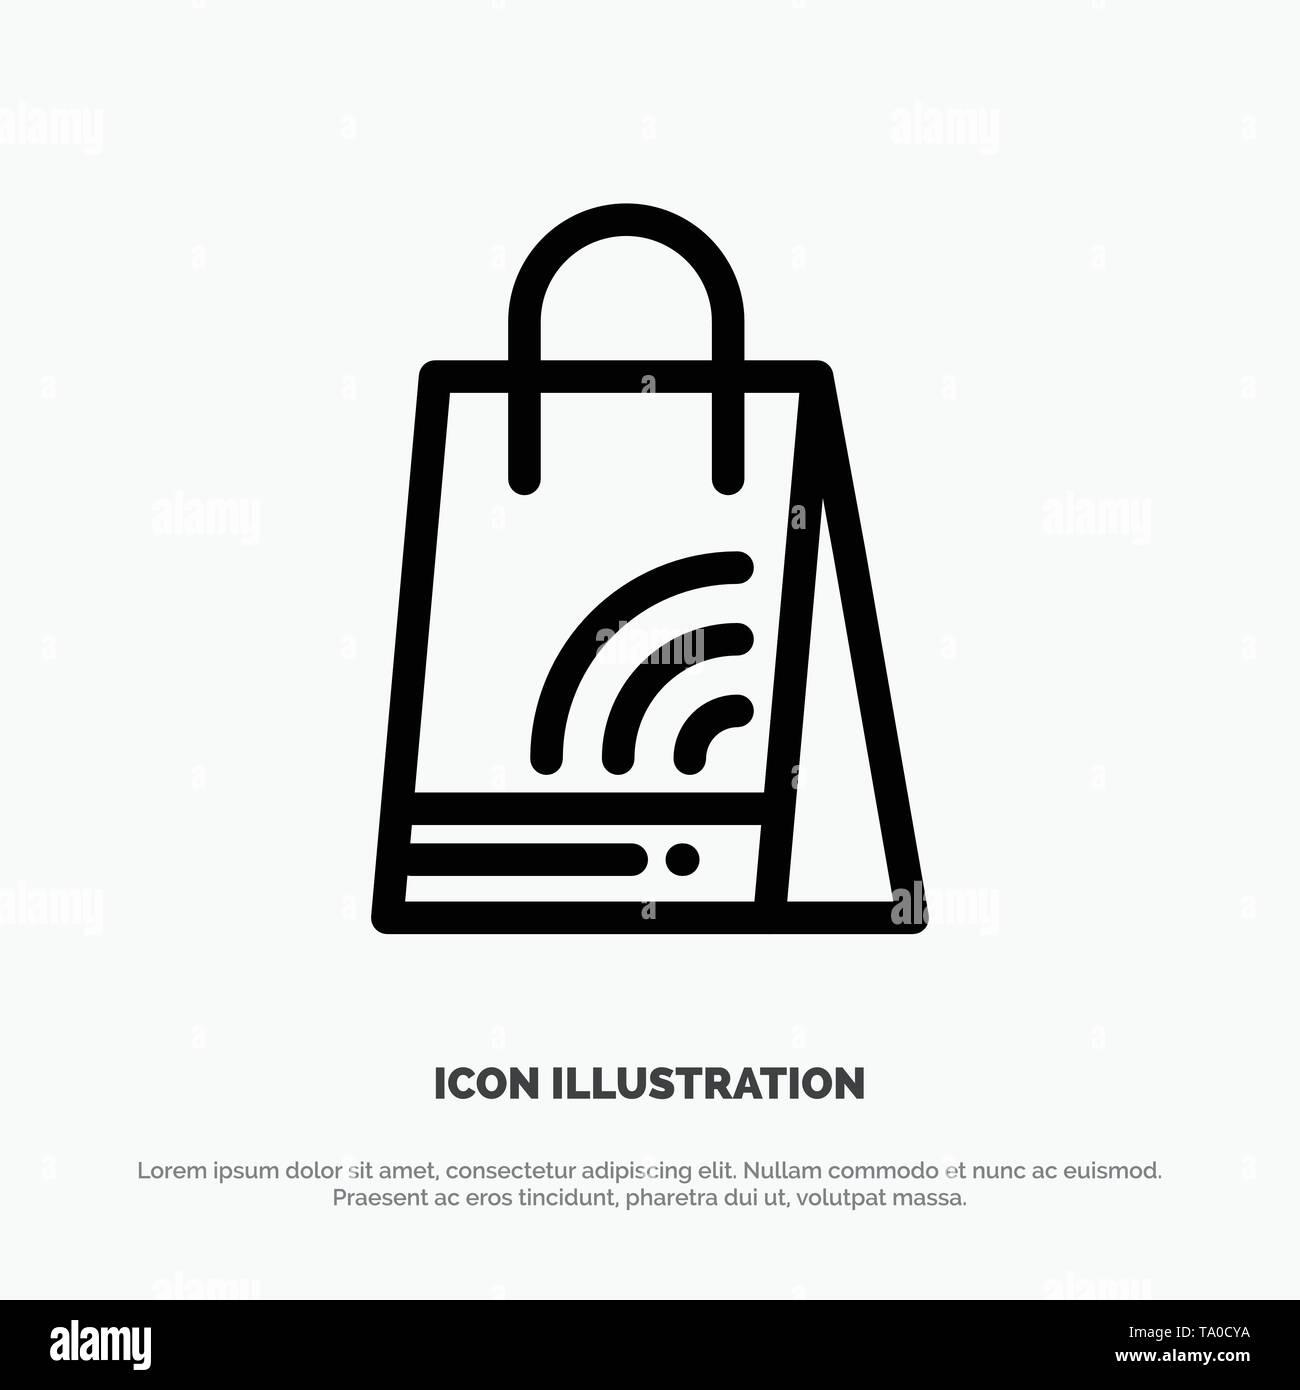 Bag, Handbag, Wifi, Shopping Line Icon Vector - Stock Image